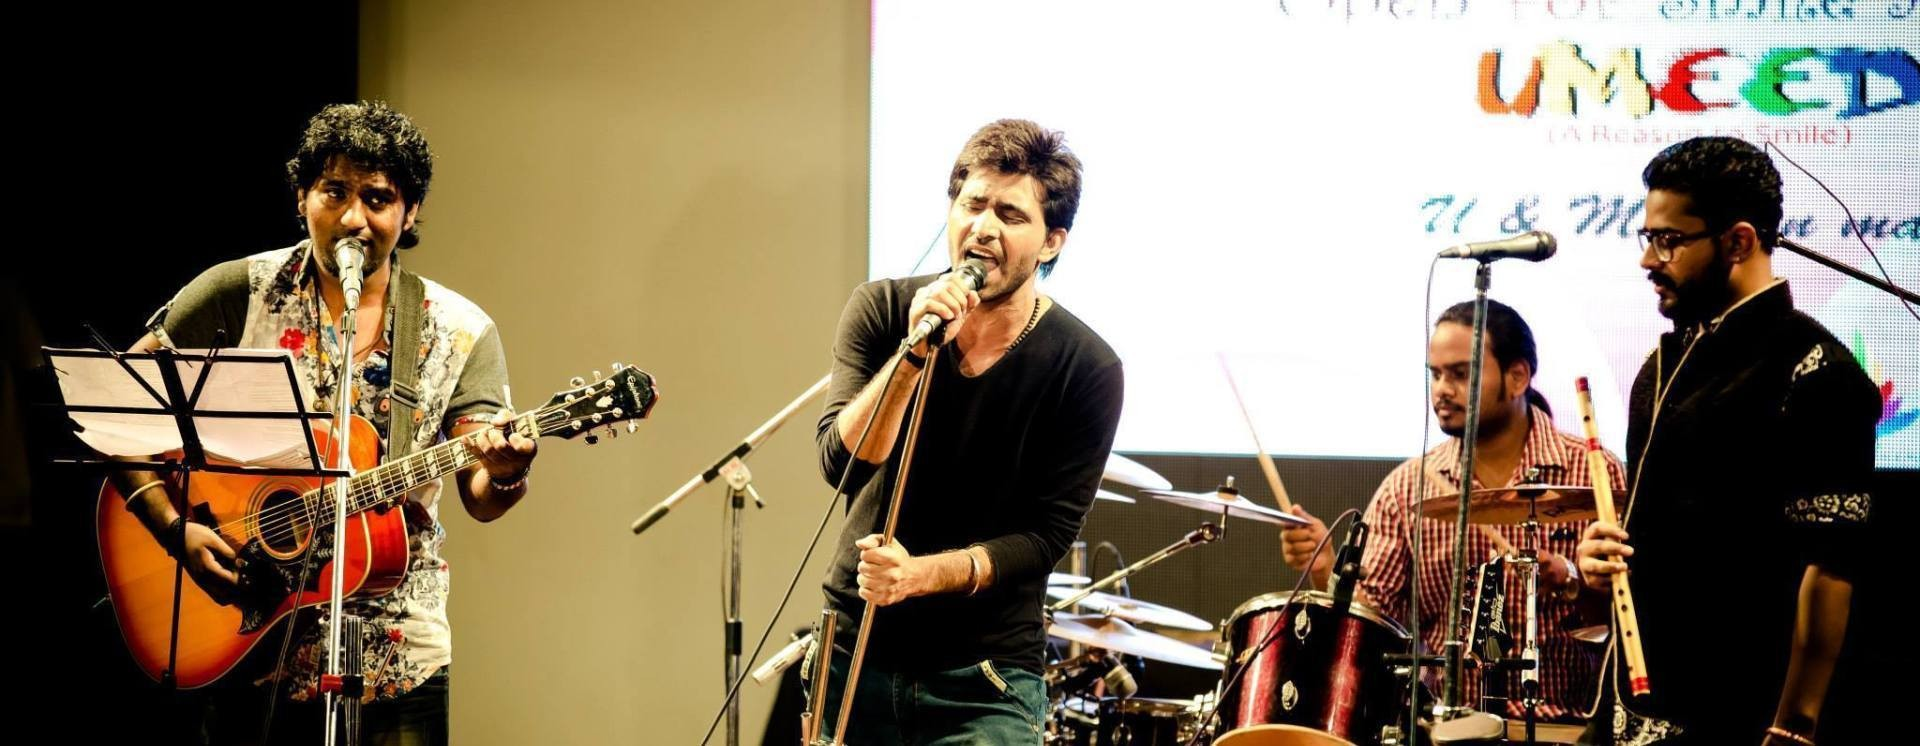 Phir Bhi Tumko Chaahunga || Guitar Instrumental || Kailash